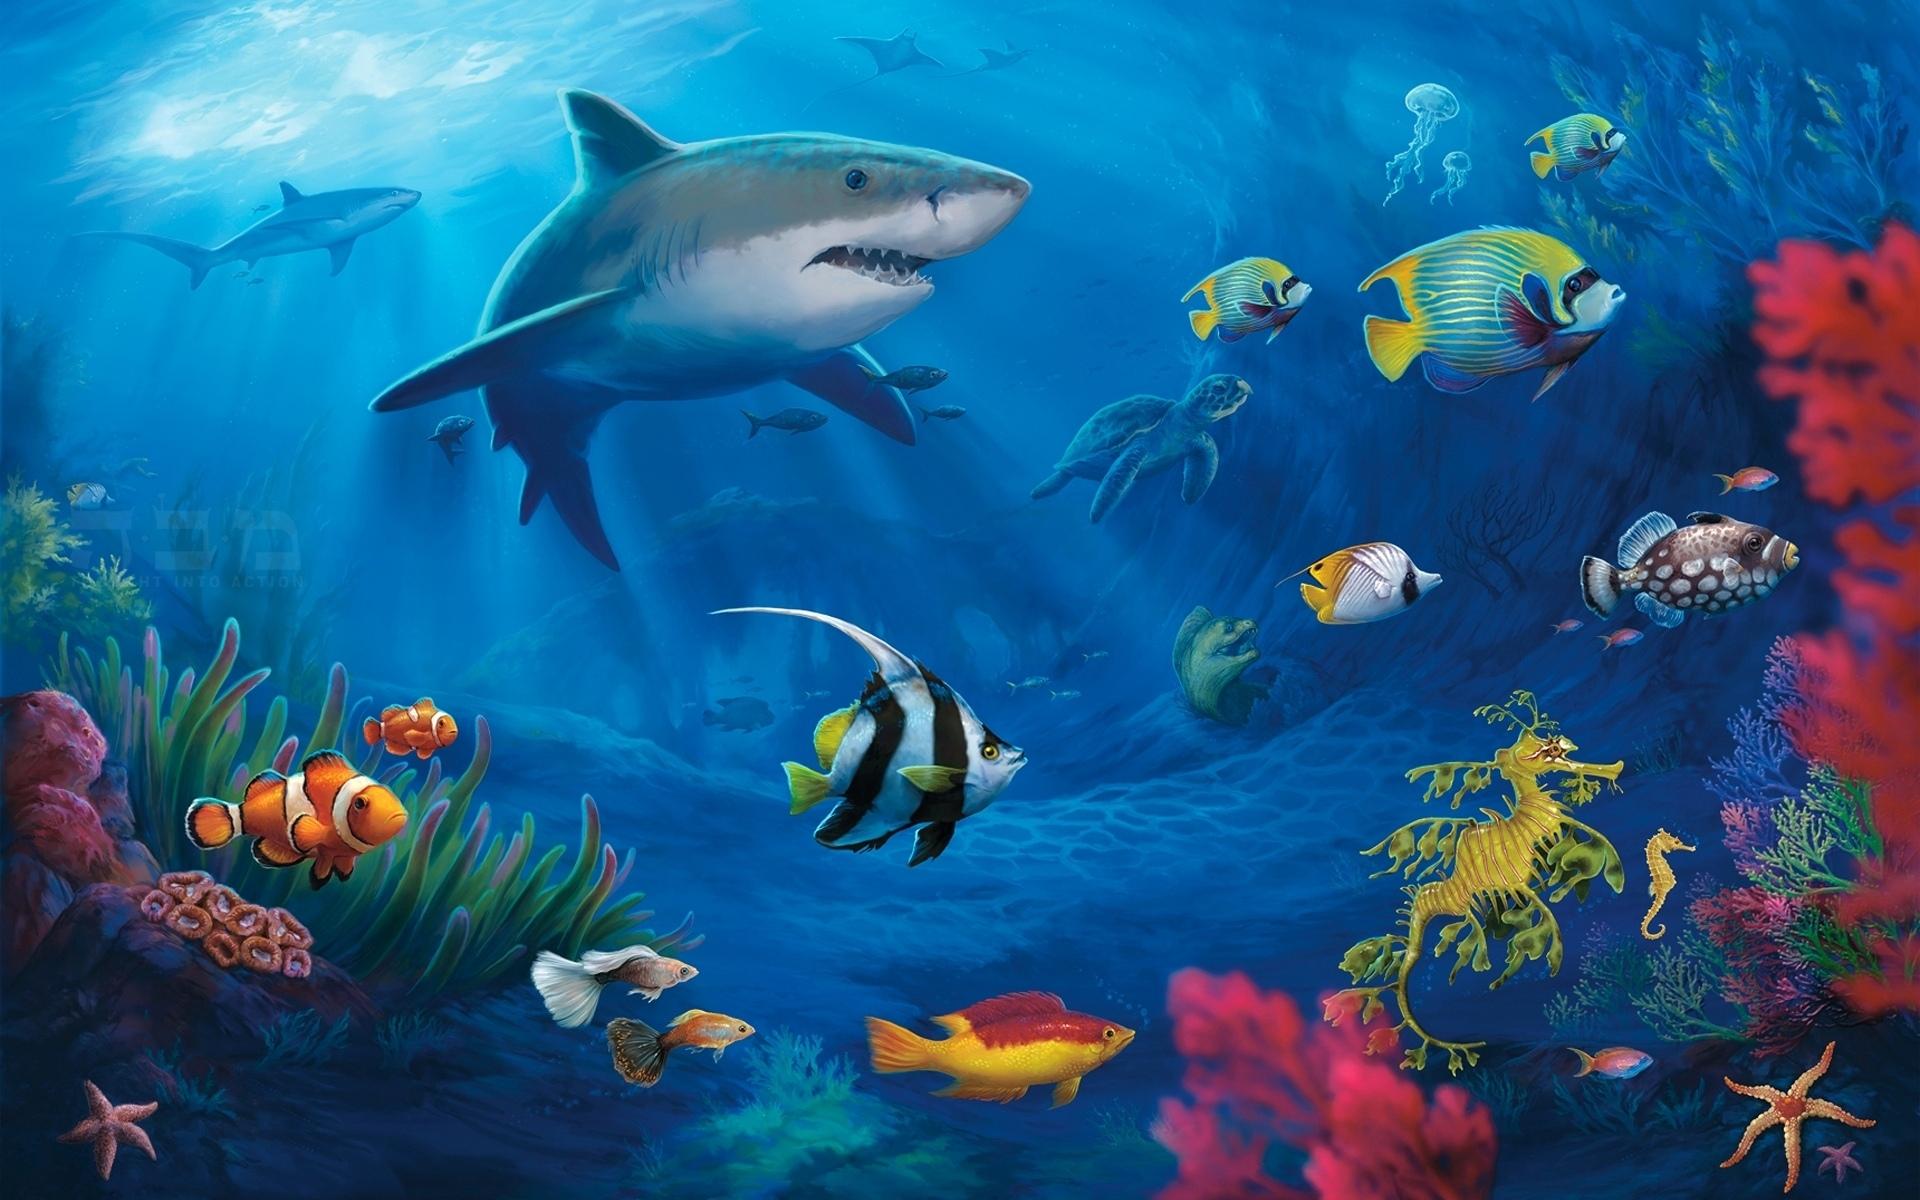 Tiburon fondos de pantalla de tiburones wallpapers hd gratis for Fondos de pantalla para tablet hd